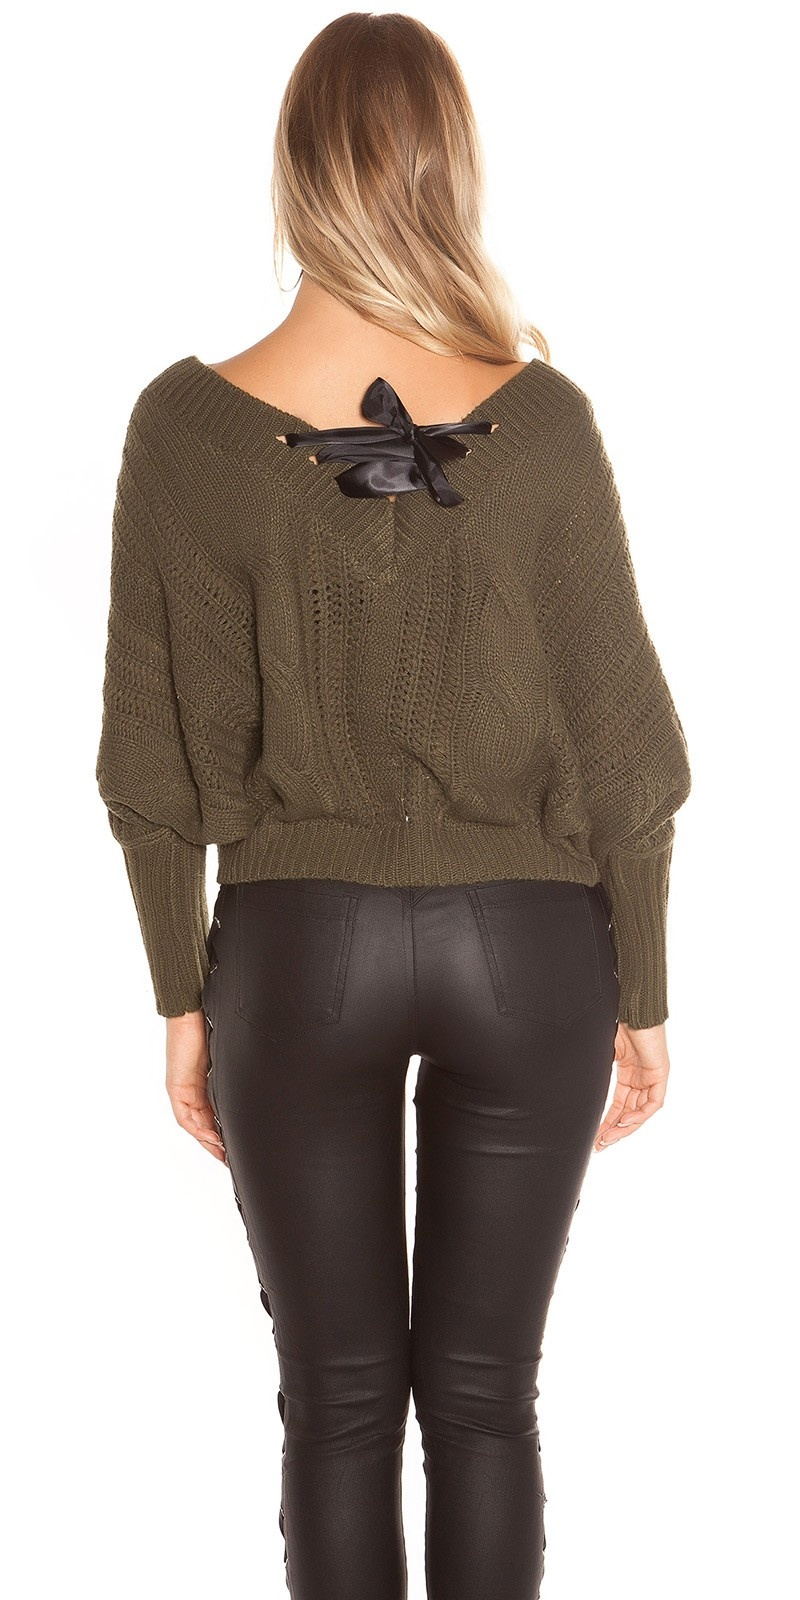 Sexy xl v-hals gebreide sweater-trui met veter khaki